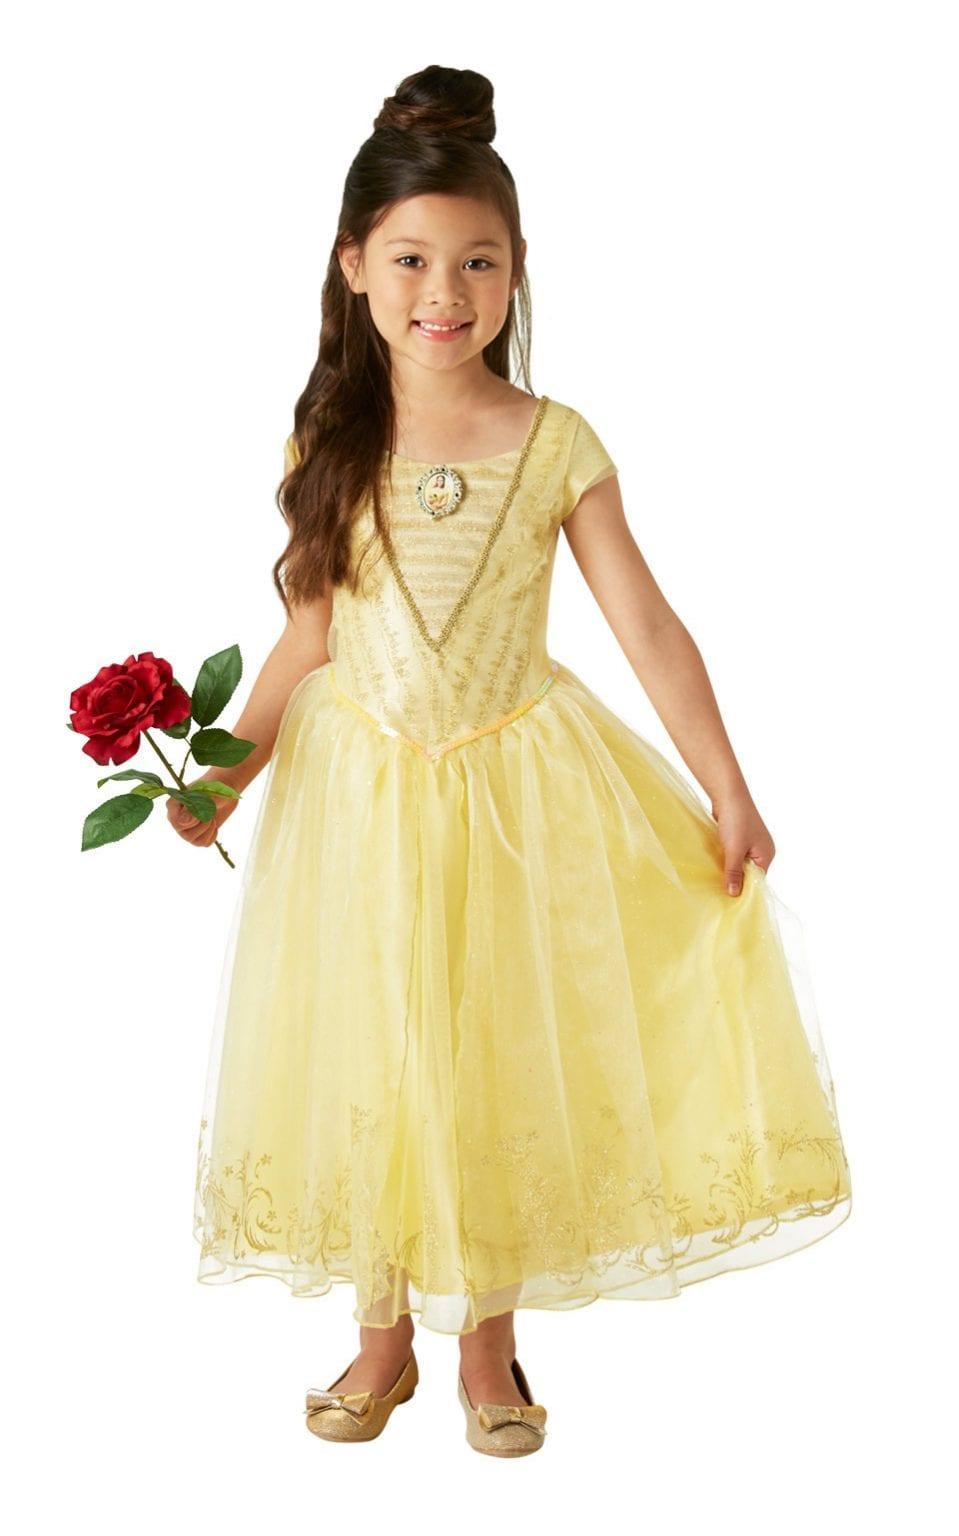 Disney's Beauty & The Beast Belle Deluxe Children's Fancy Dress Costume